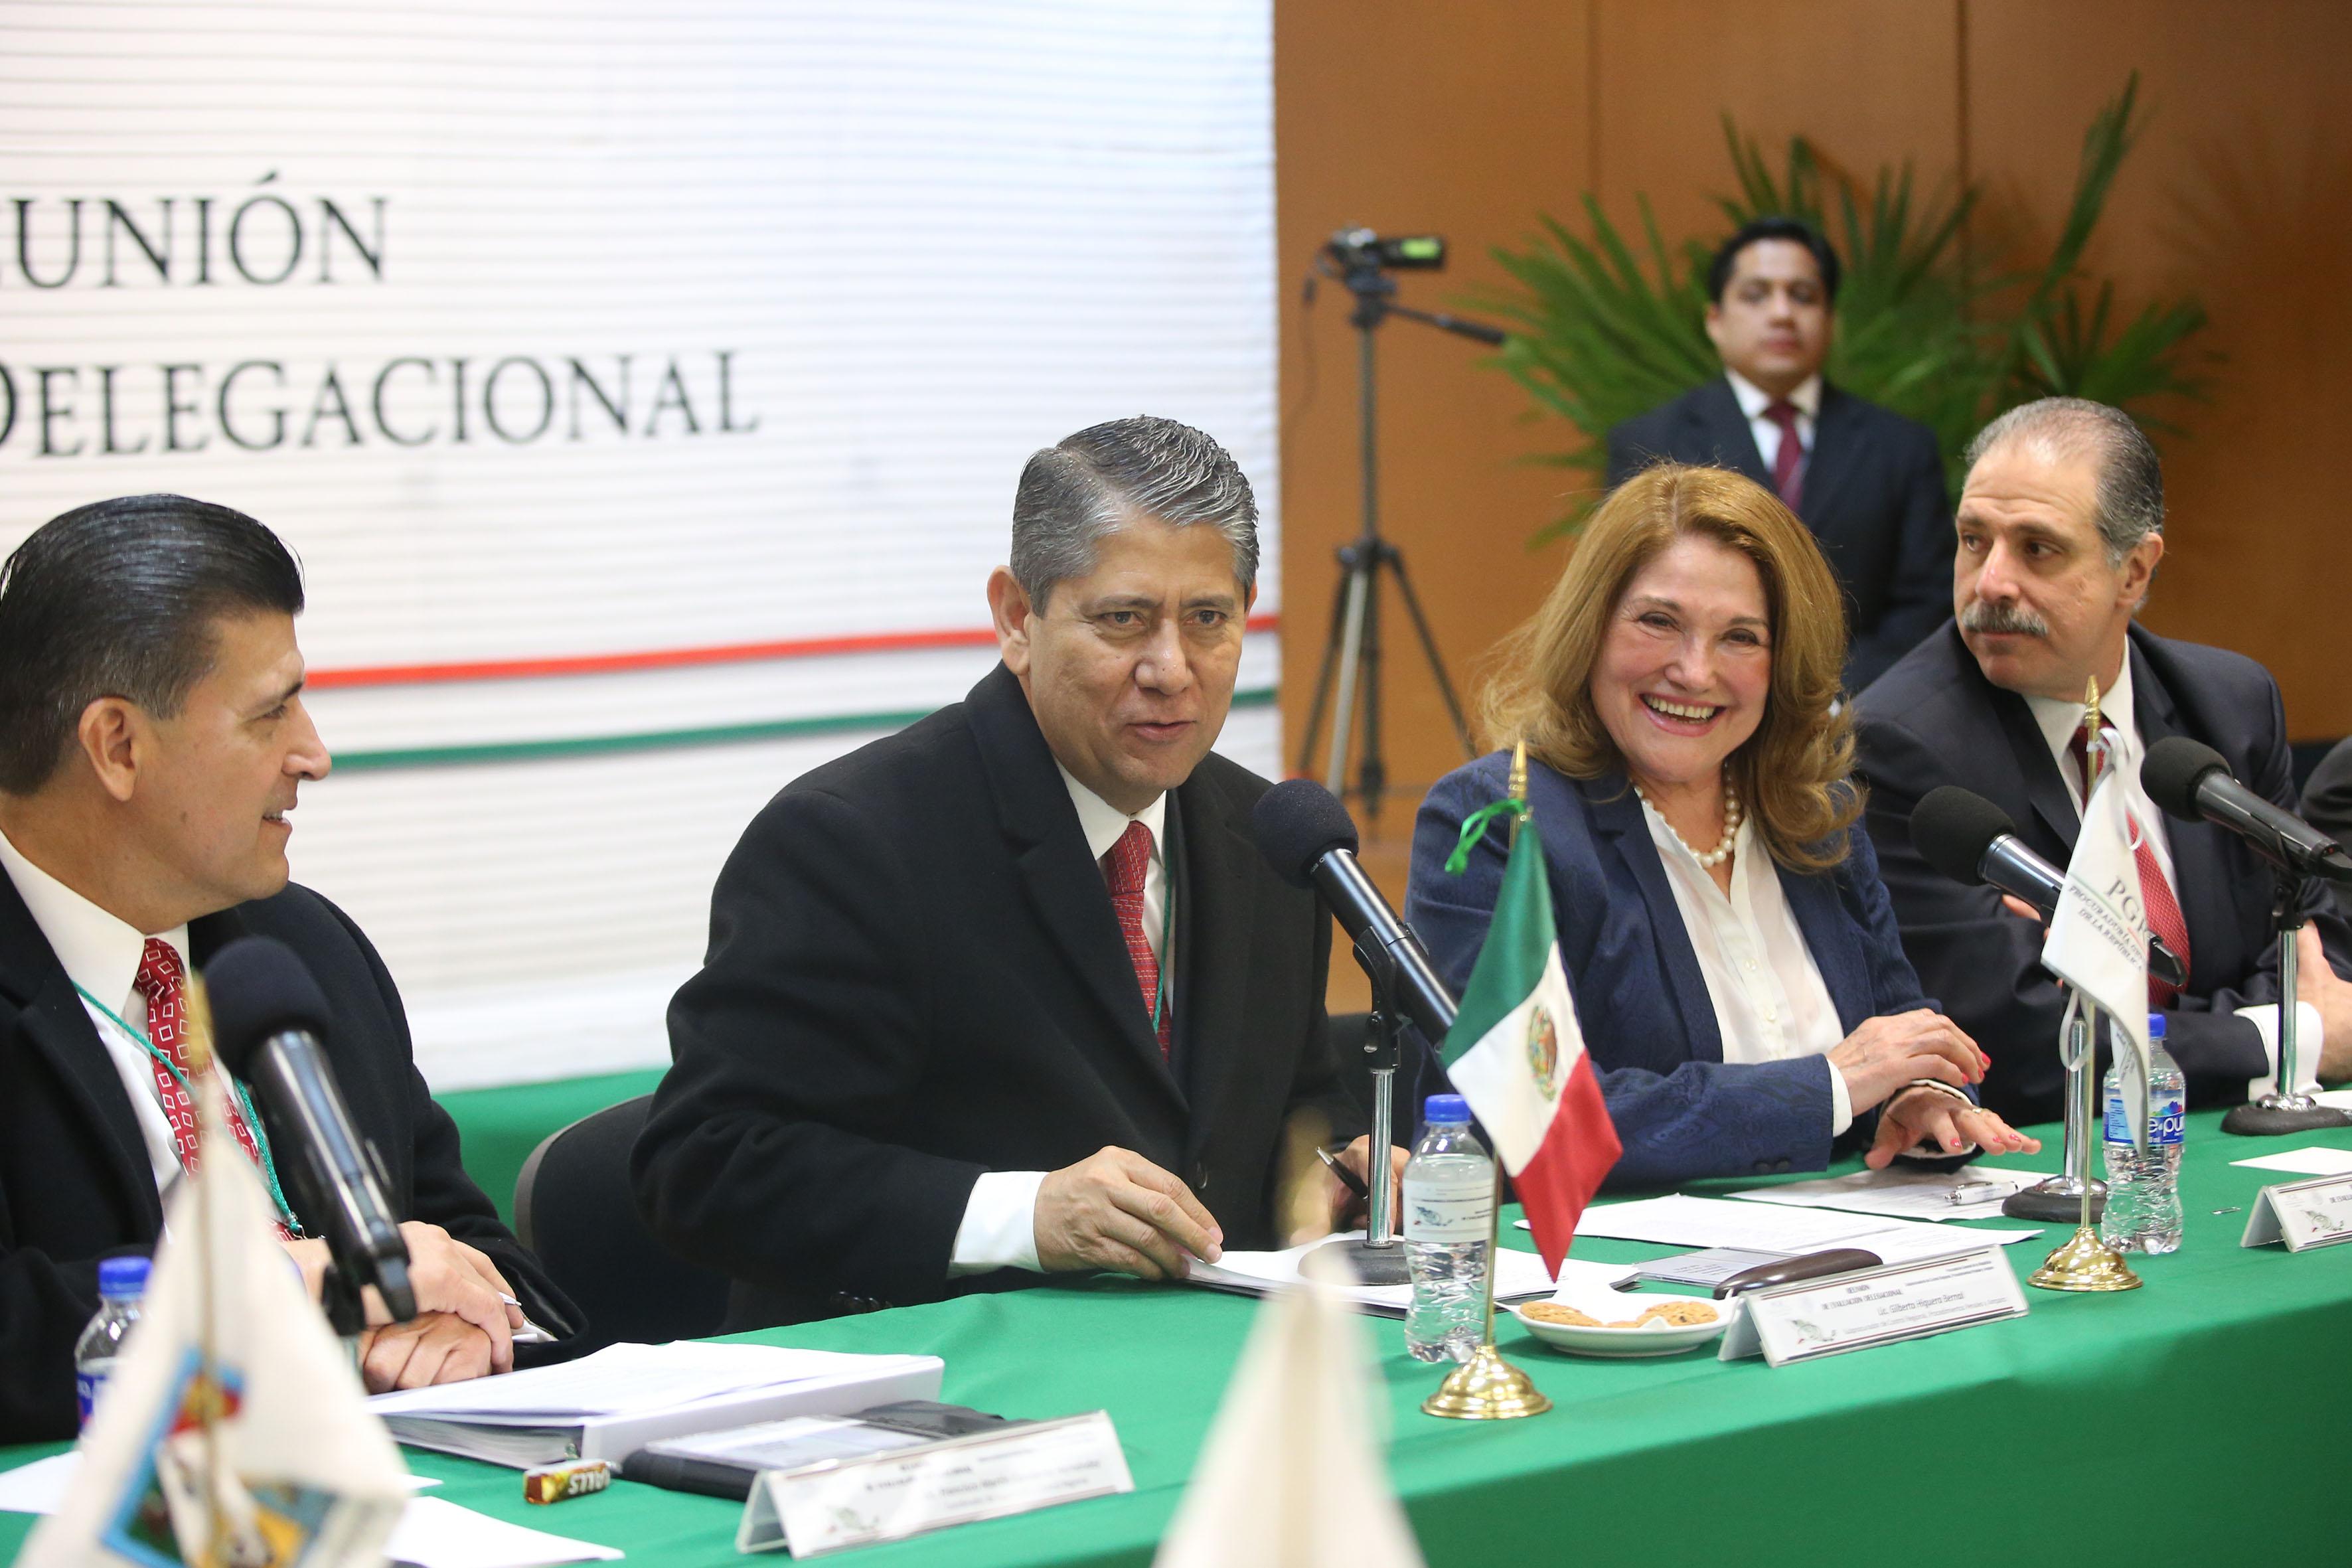 12 03 16 5a Reunio n delegacional PGR9.jpg